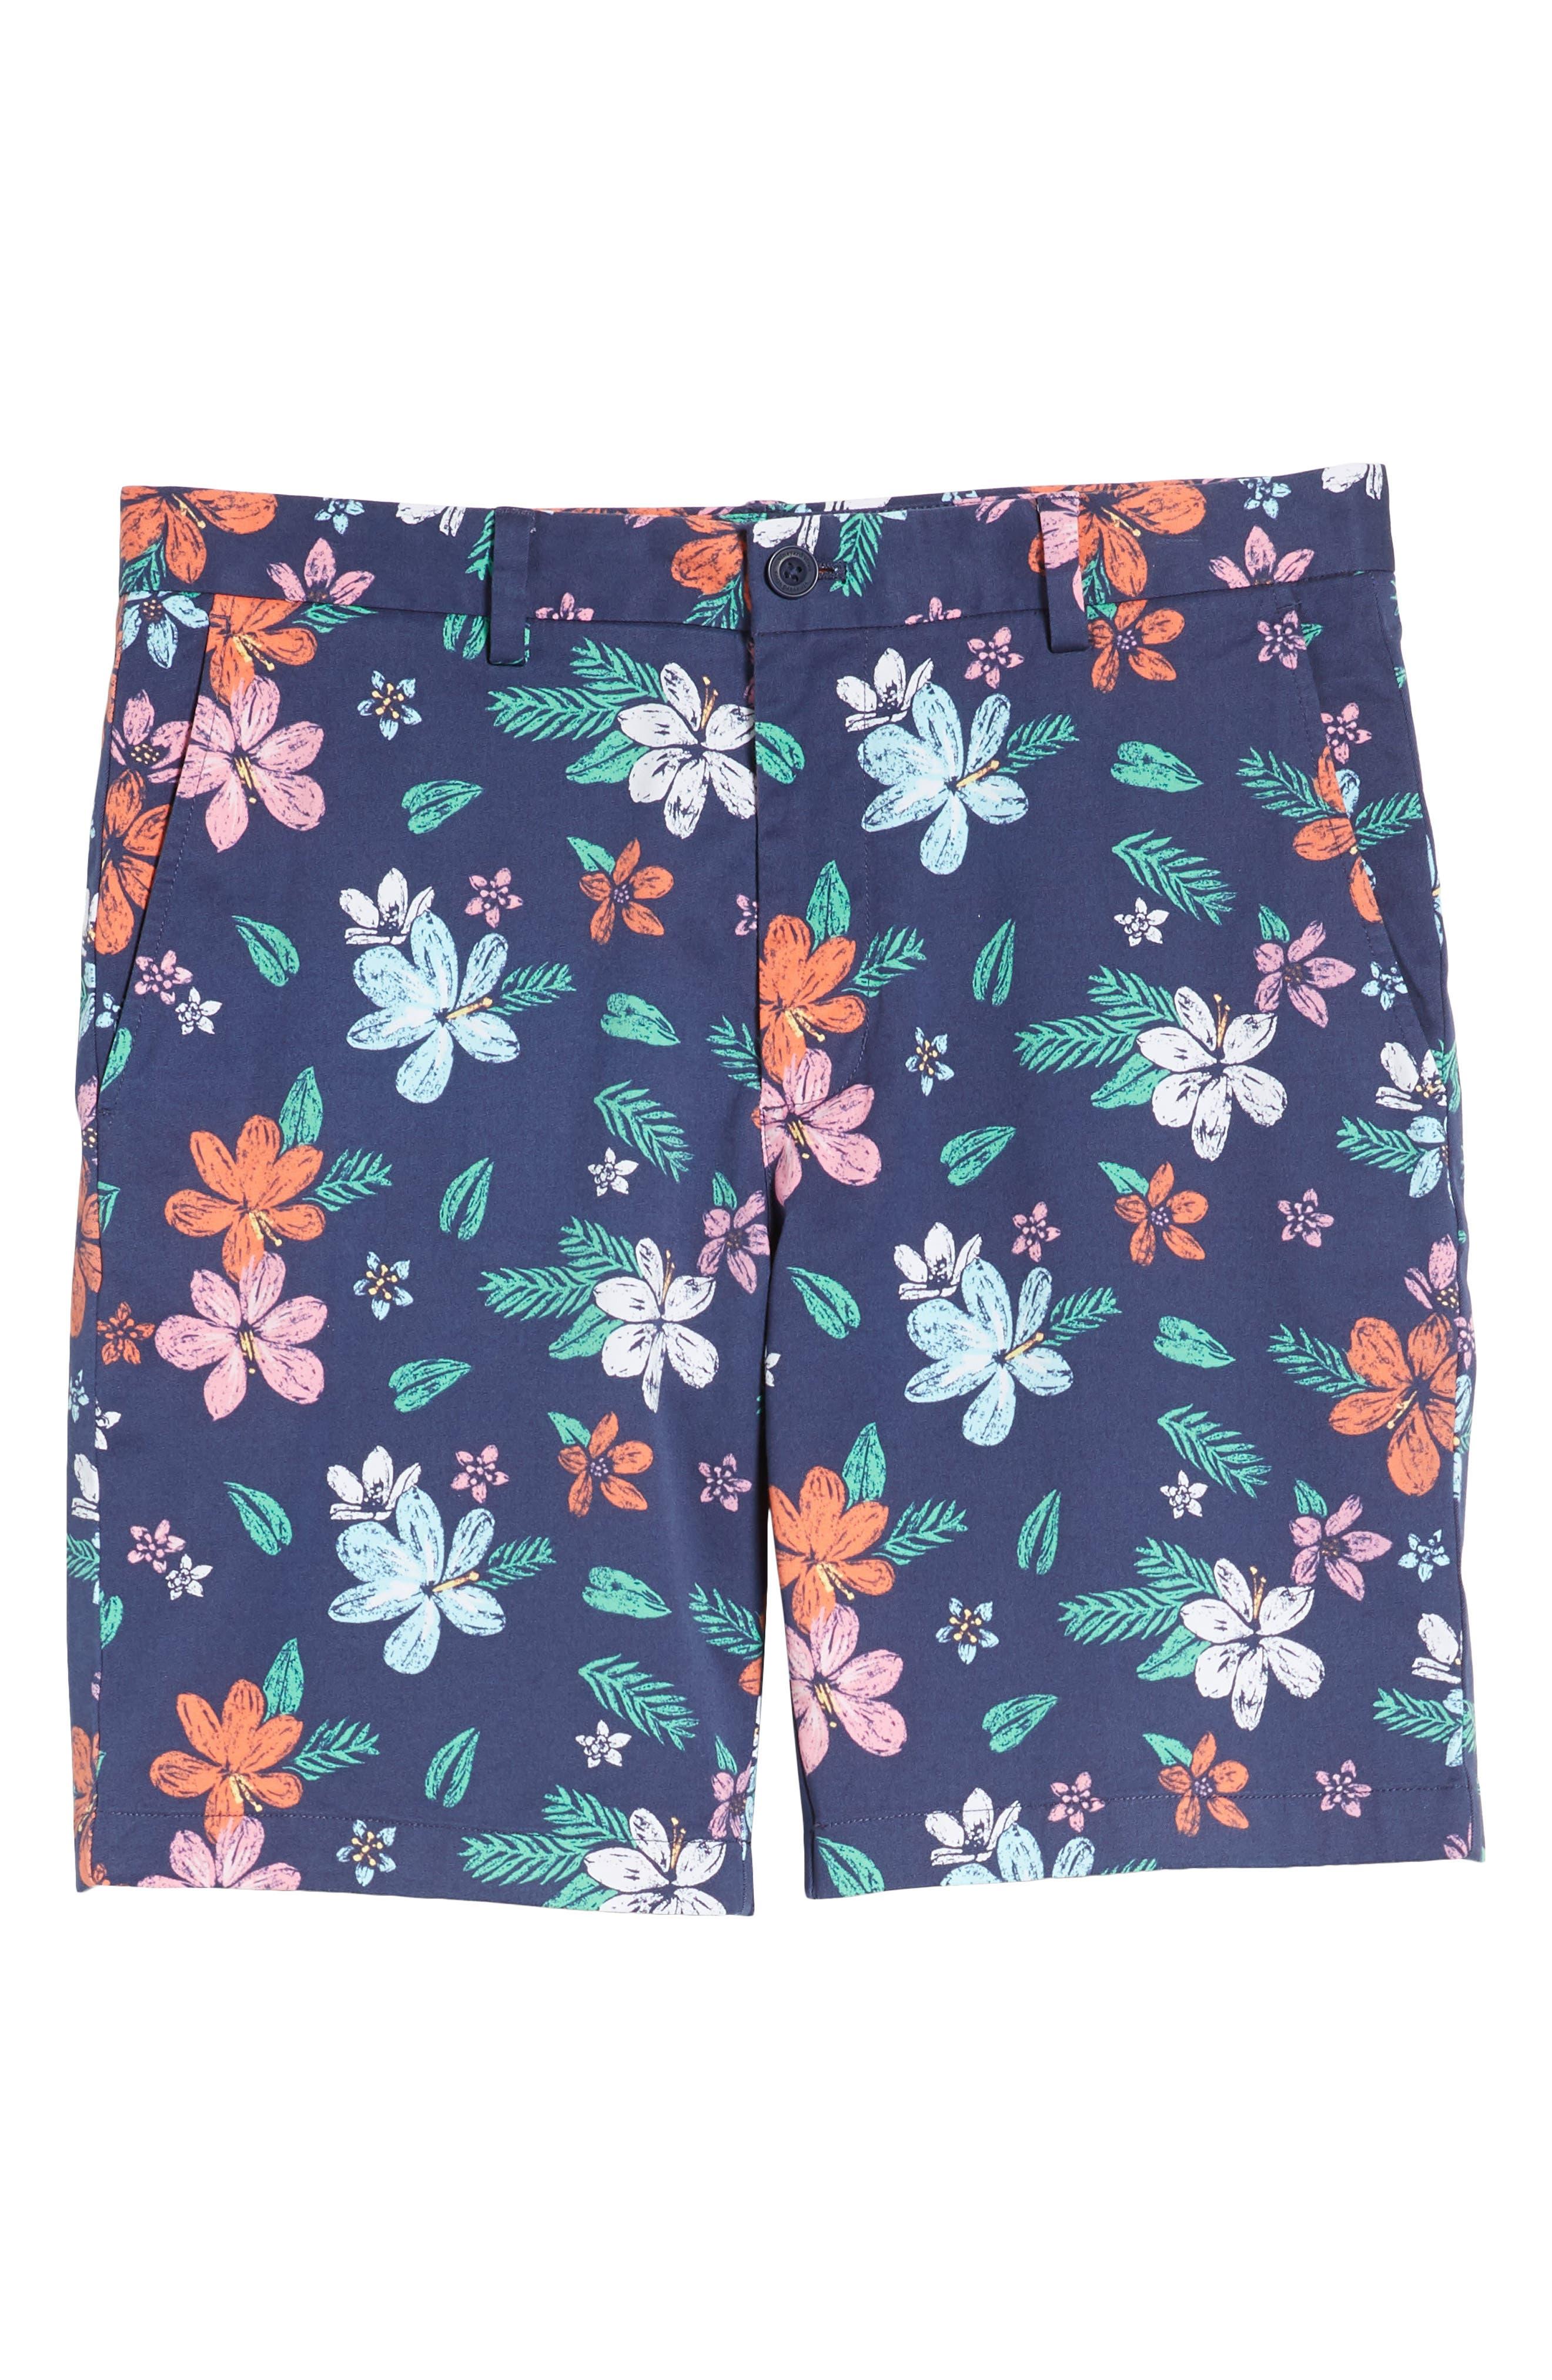 Floral Print Breaker Shorts,                             Alternate thumbnail 6, color,                             400